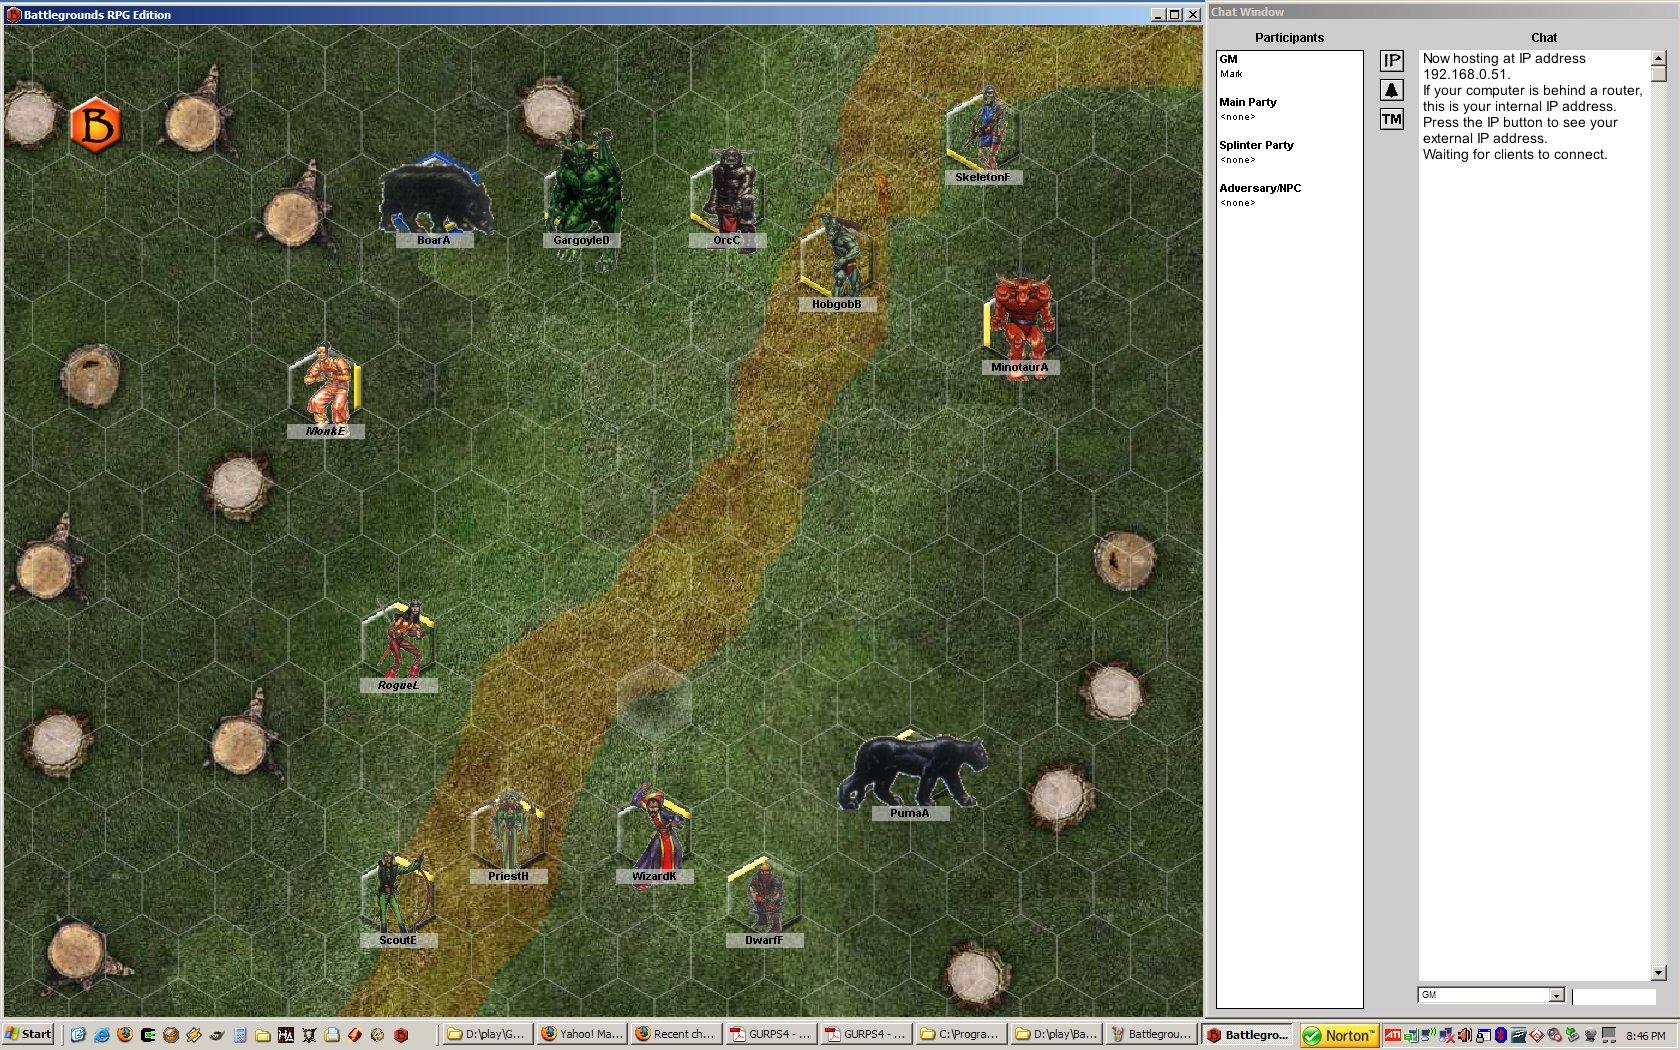 BattlegroundRPG-straighhton